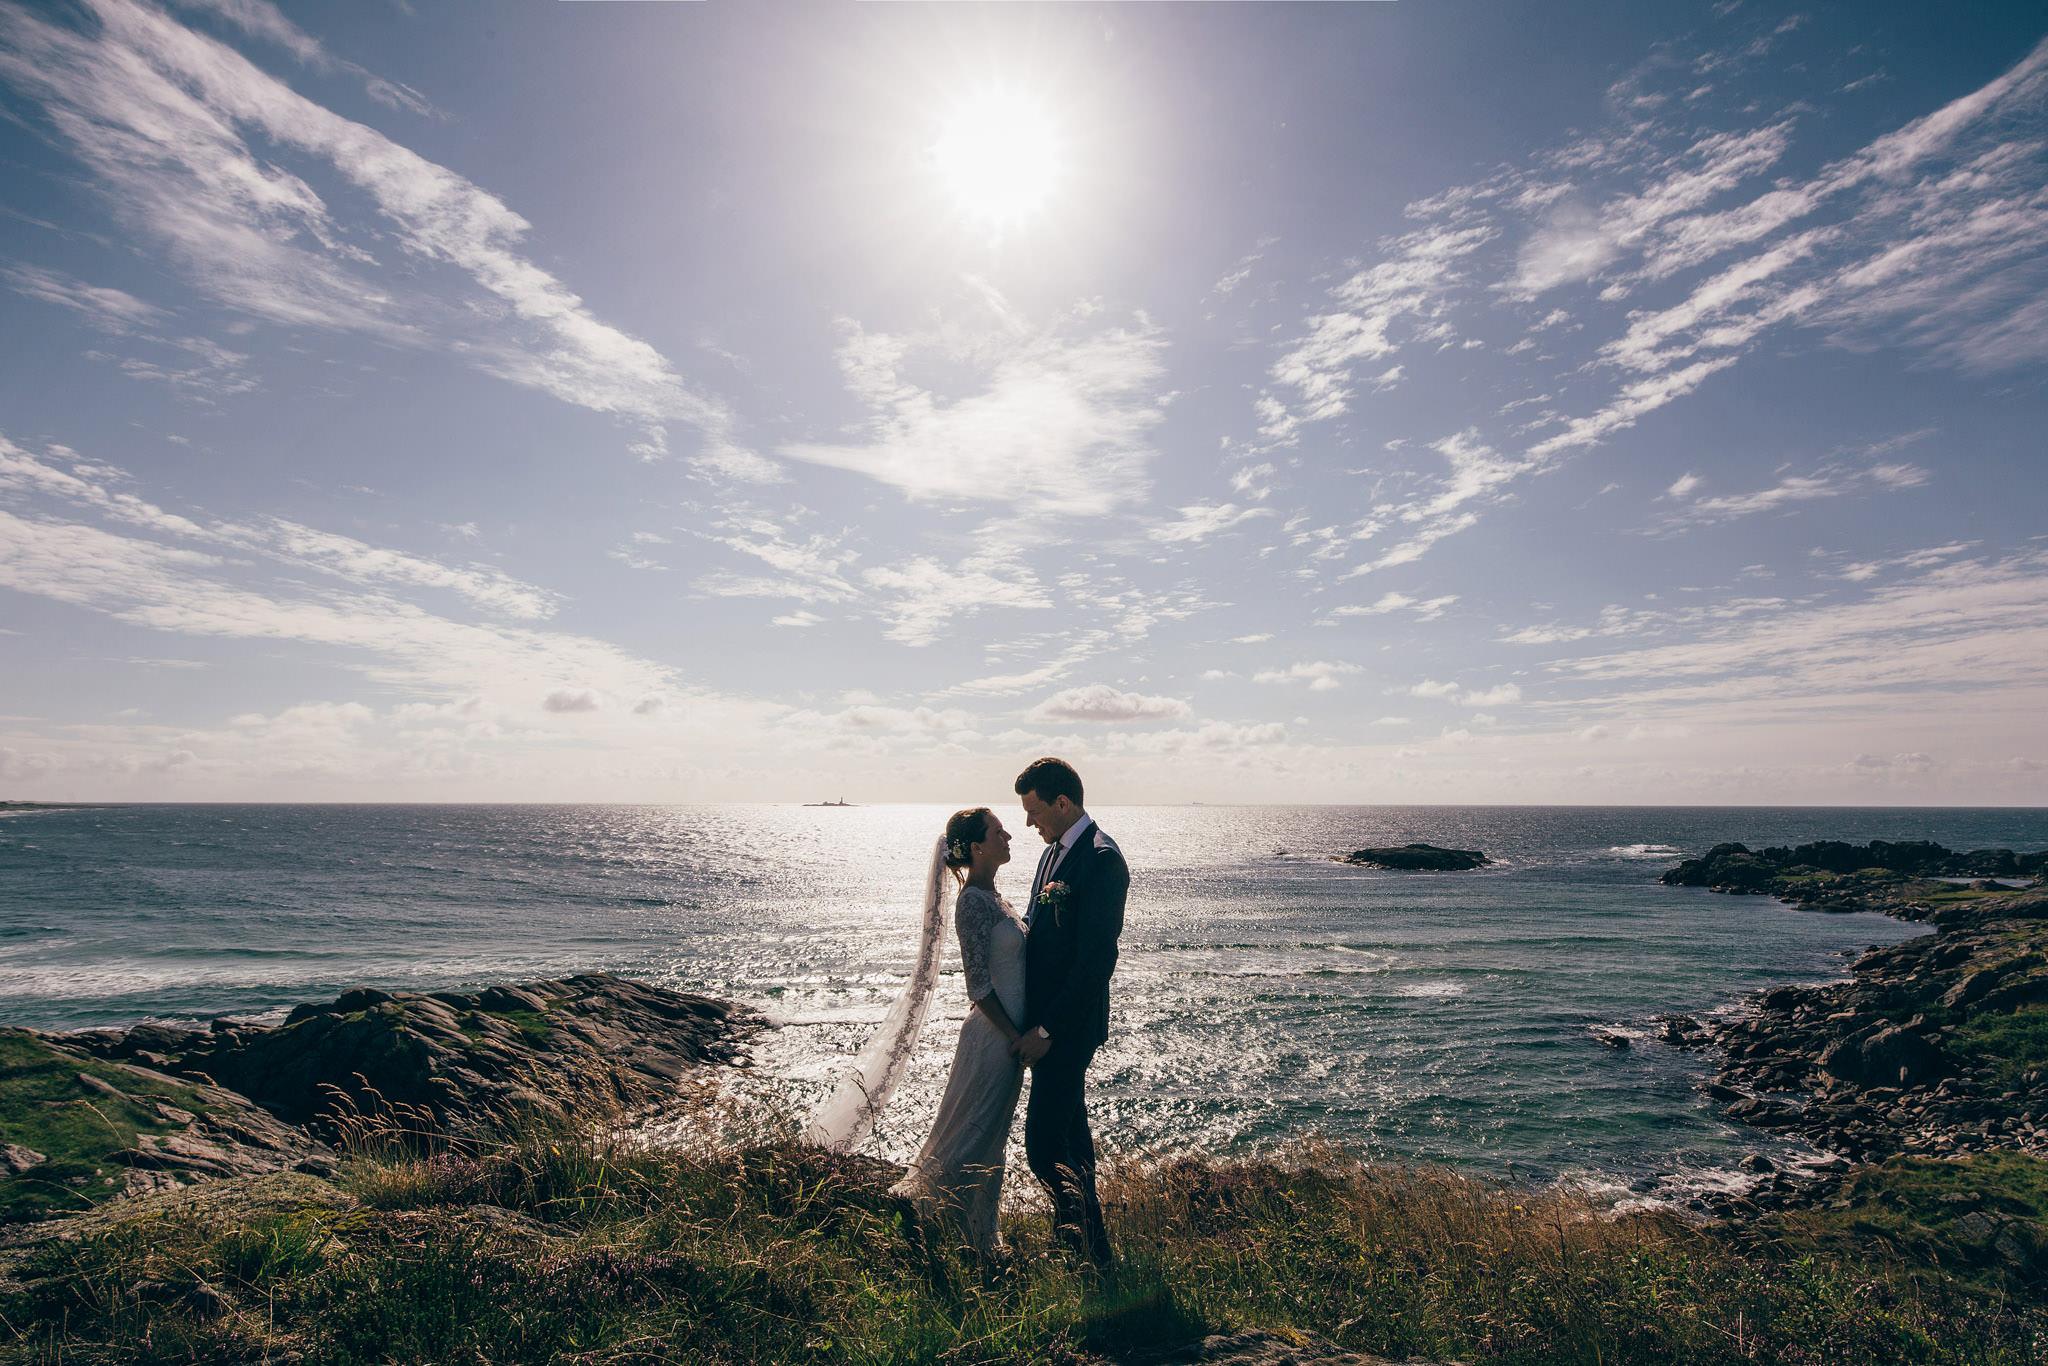 Norway+wedding+photographer+elopement+pre+wedding+Casey+Arneson-95.jpg